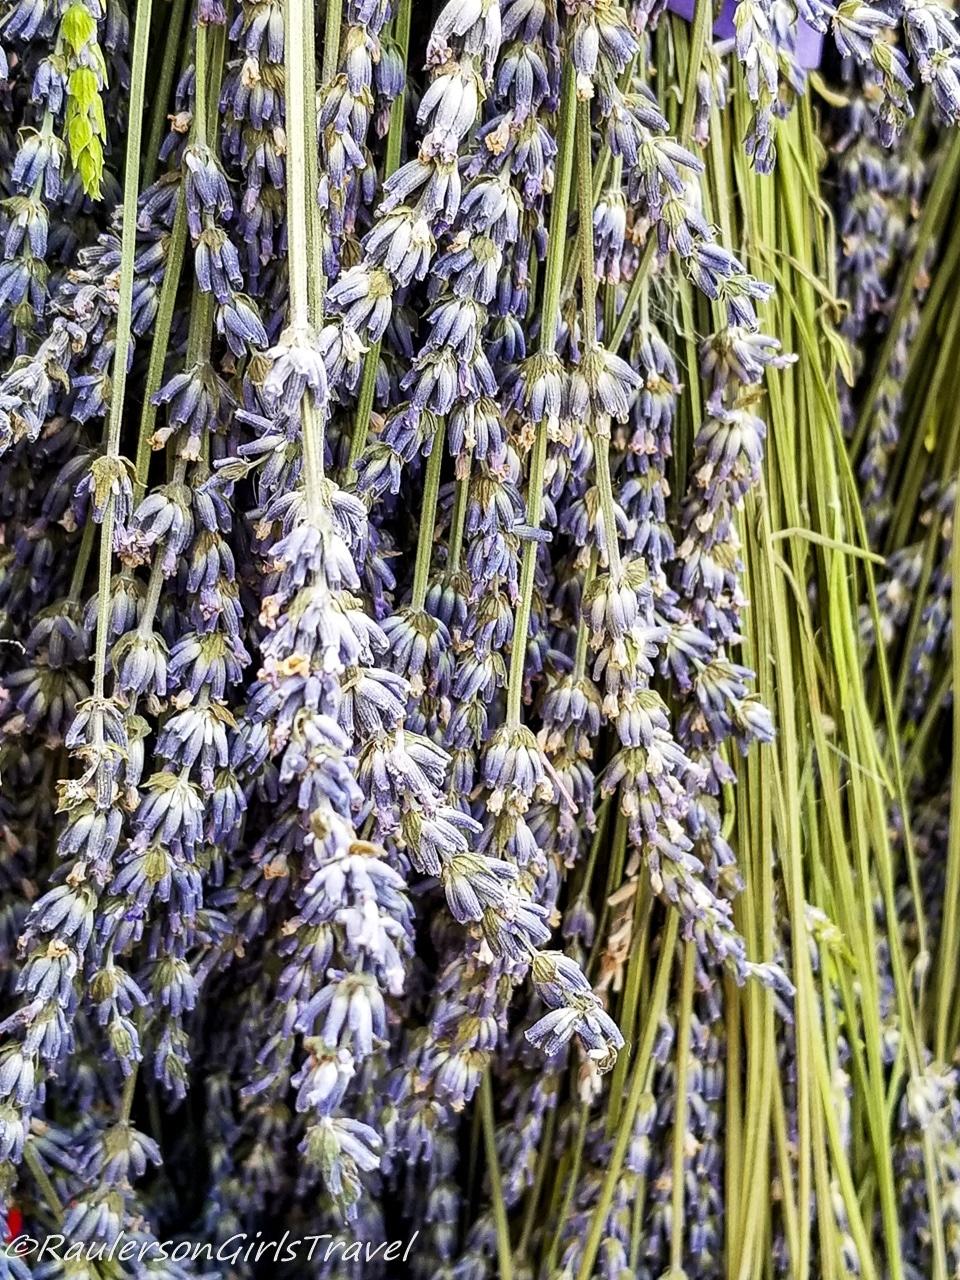 Close-up of Lavender bundles